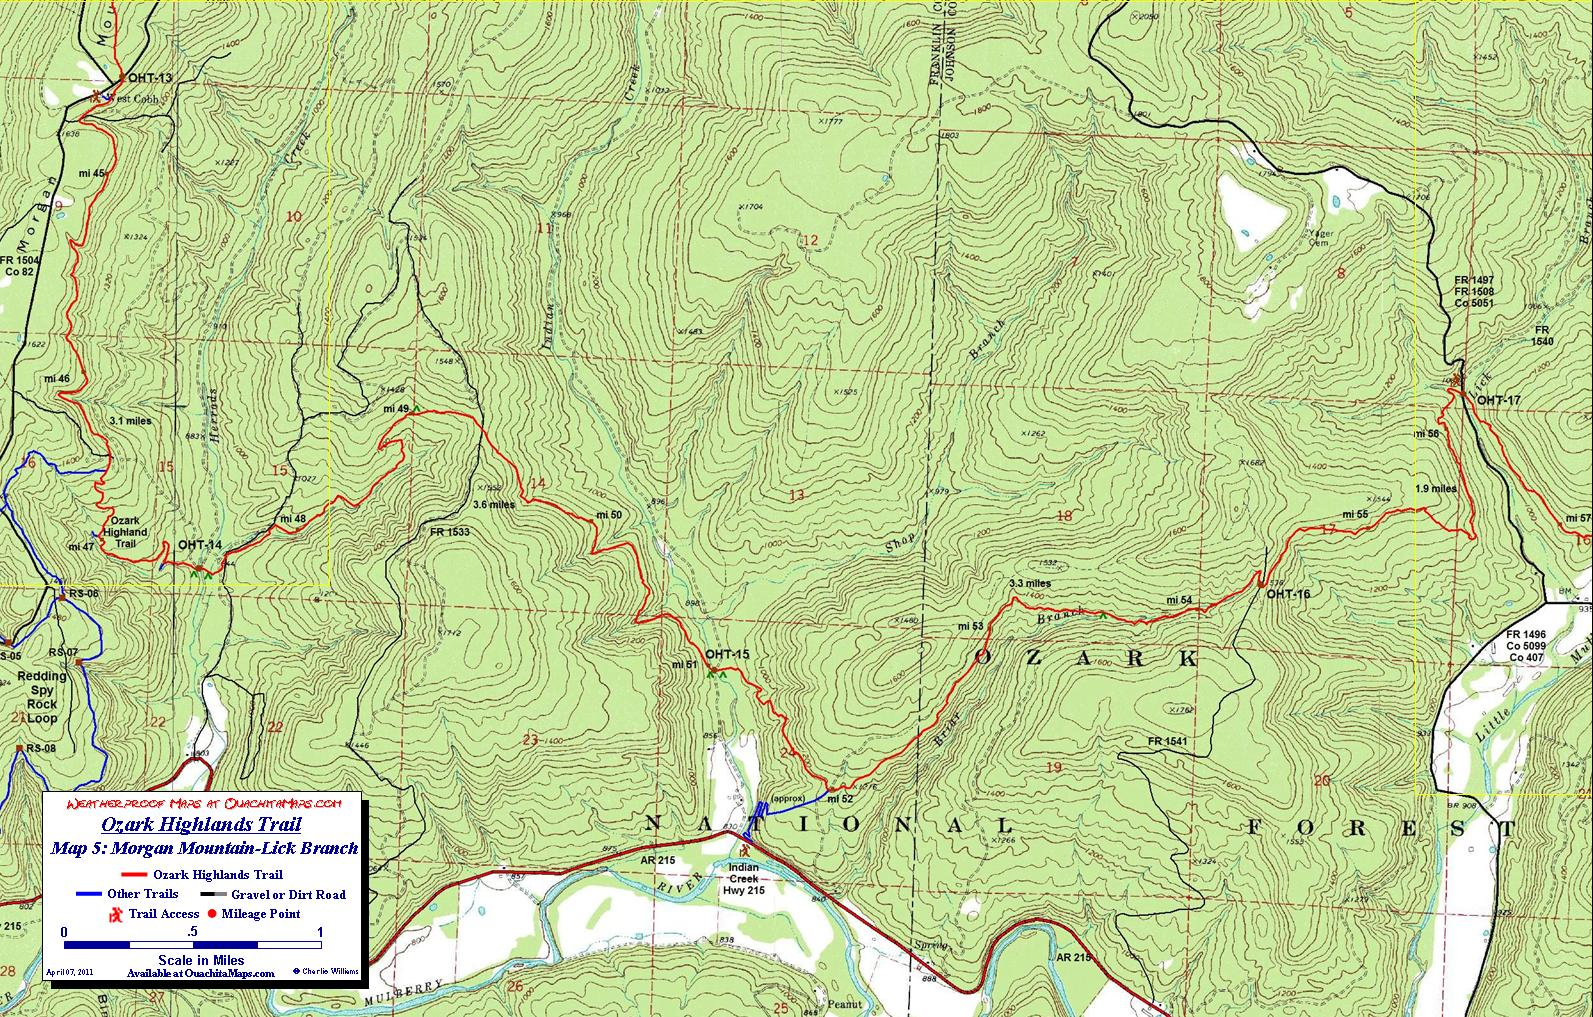 Free Arkansas Topographic Map.Ozark Highlands Trail Maps Ozark Mountains Arkansas Free Detailed